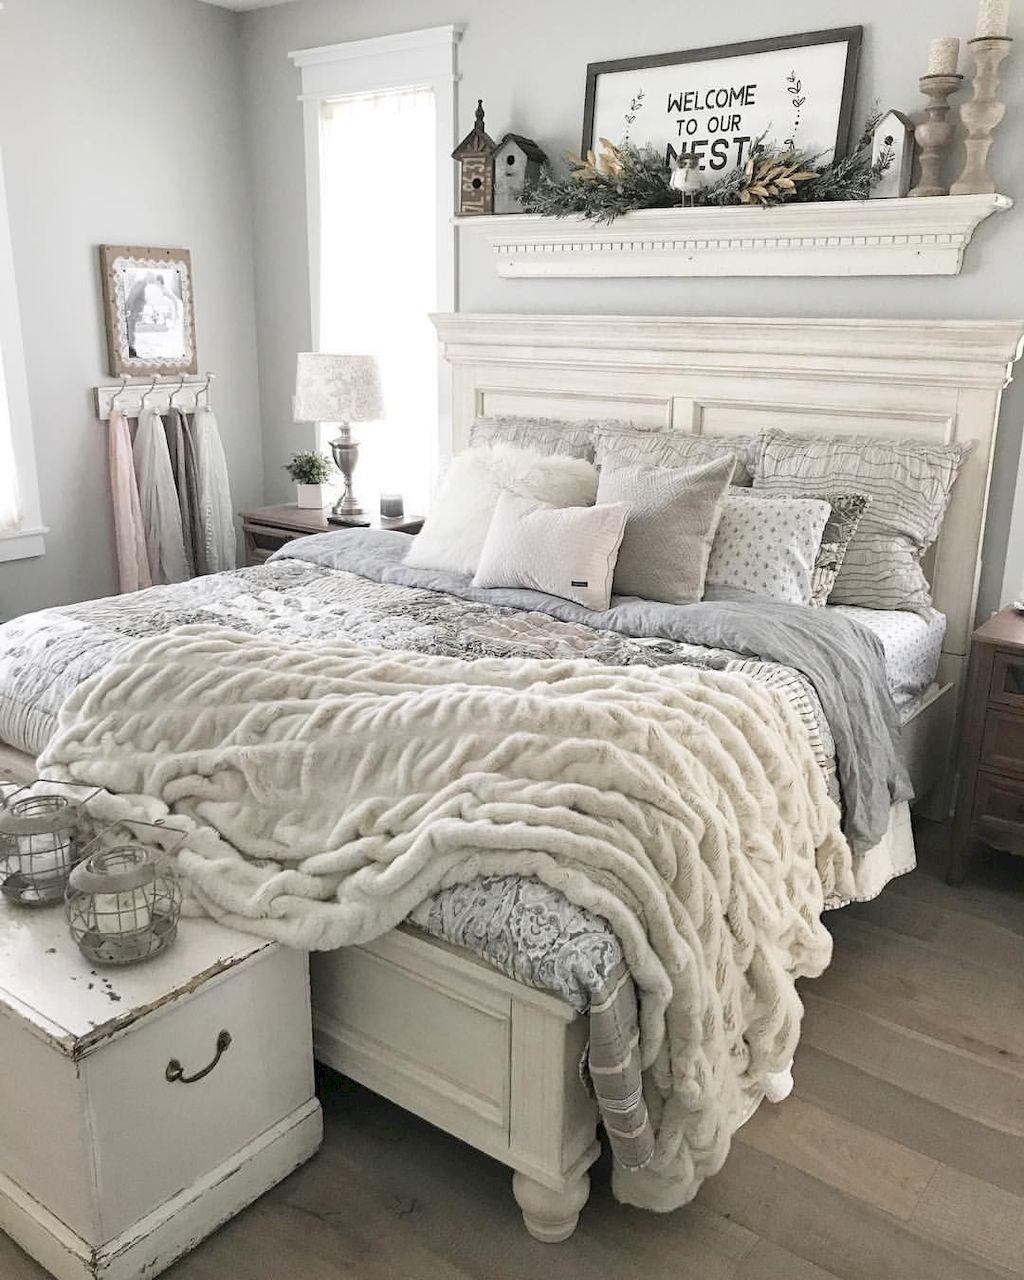 55 Small Master Bedroom Design Ideas – Gladecor.com